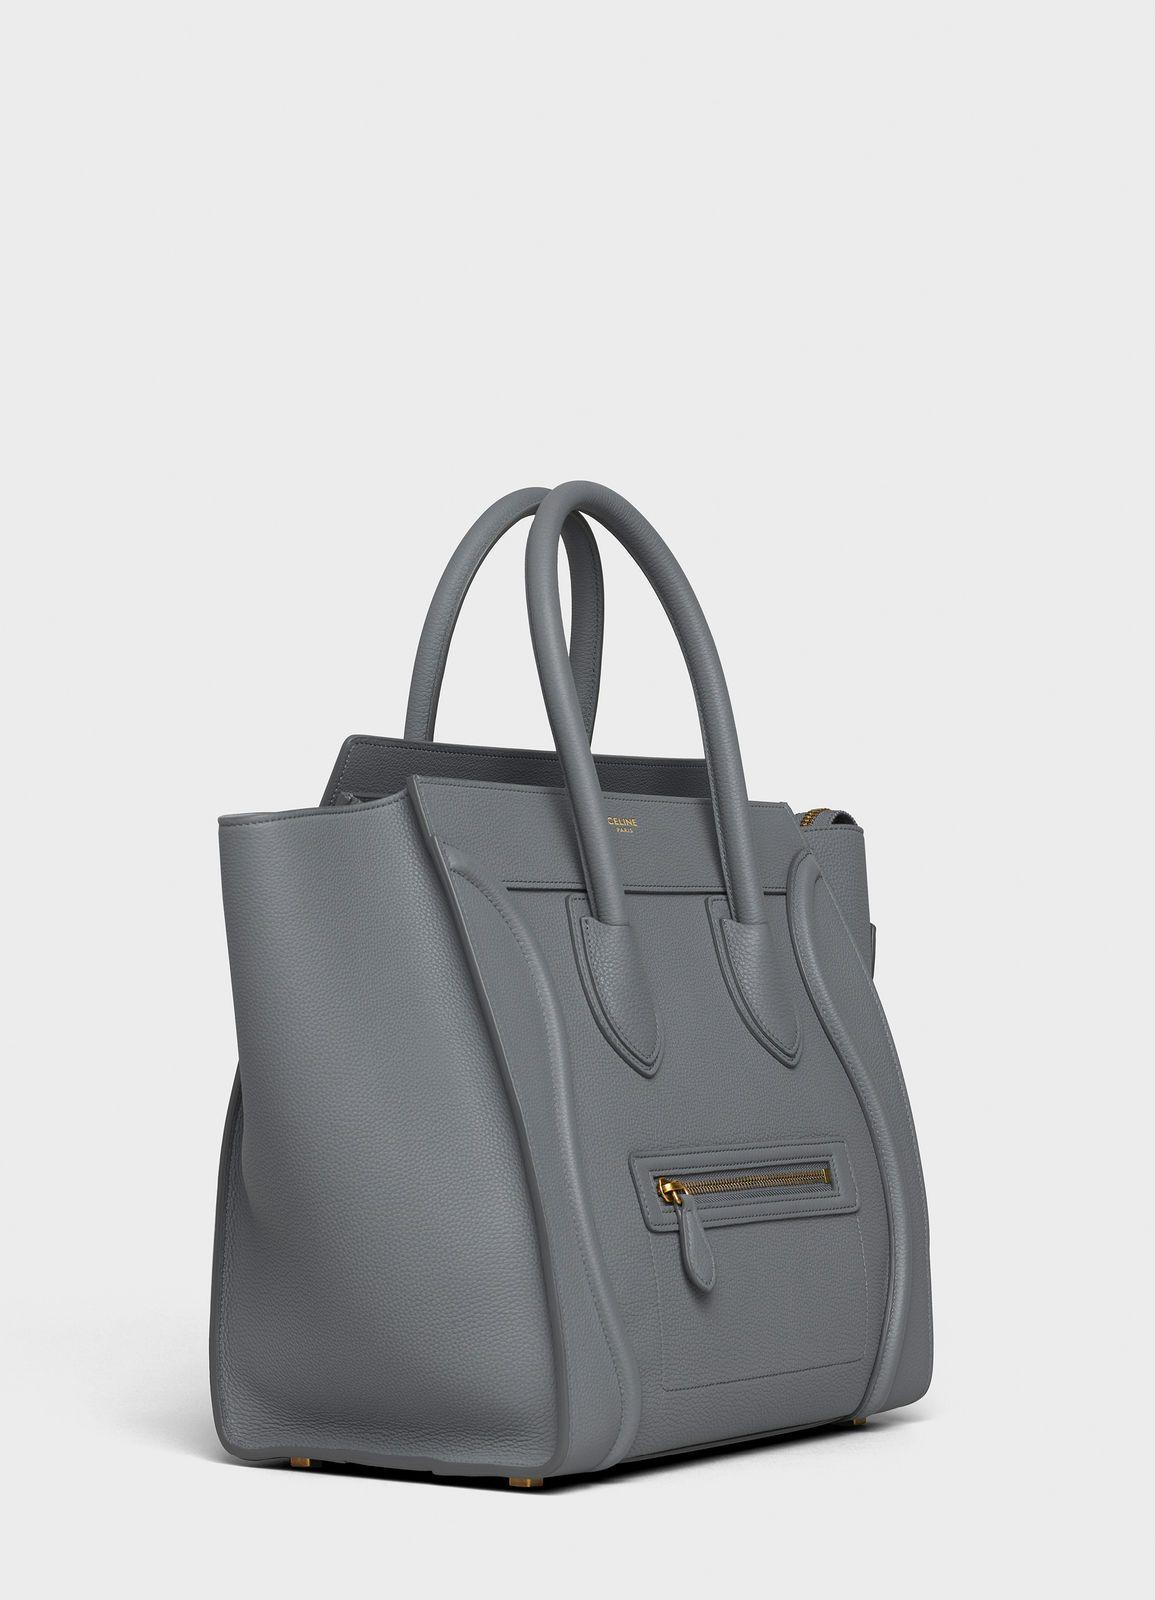 3d2c286534f Mini Luggage handbag in baby drummed calfskin